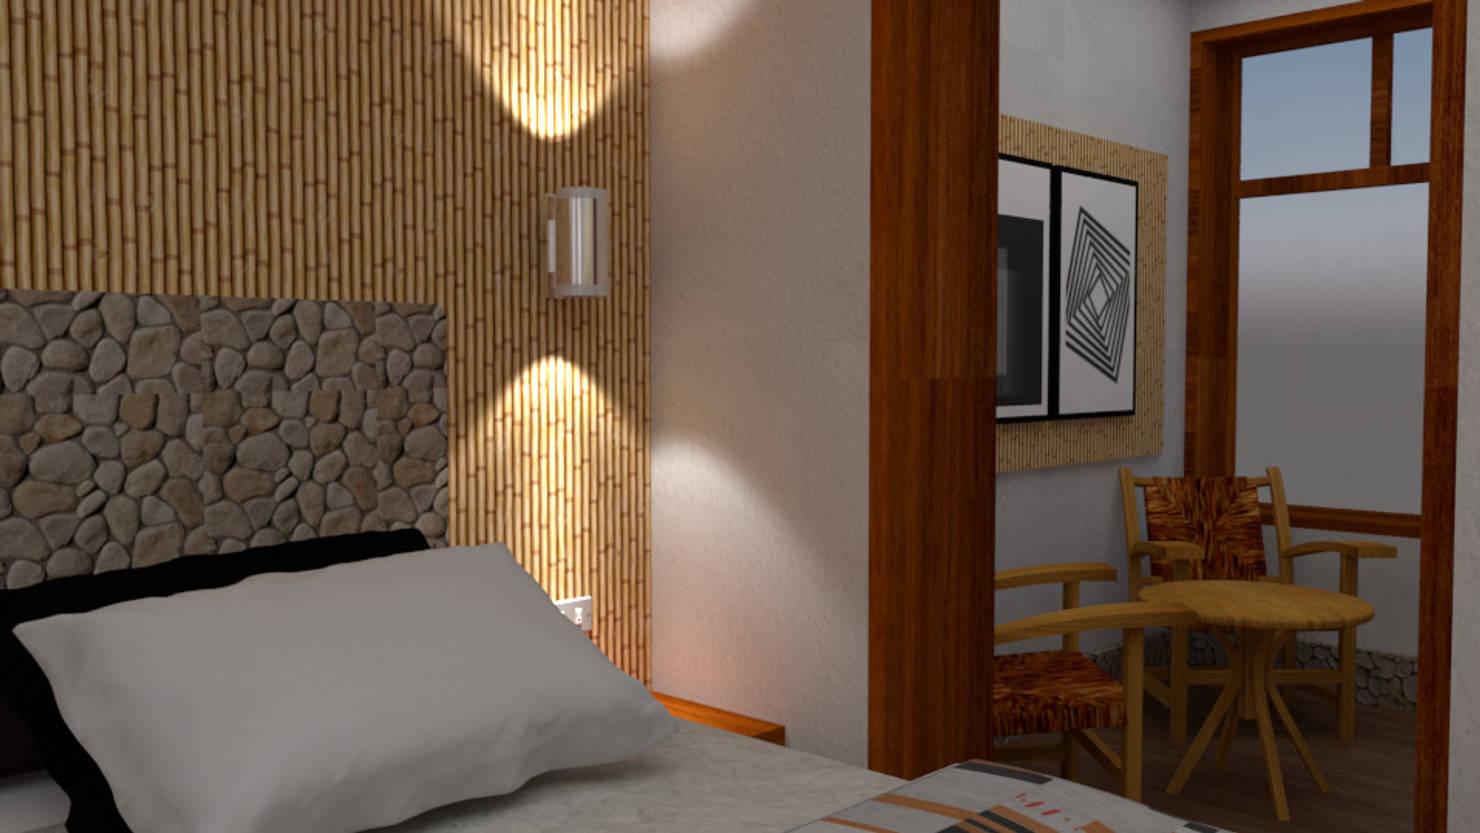 Encántate con este increíble diseño de interior peruano